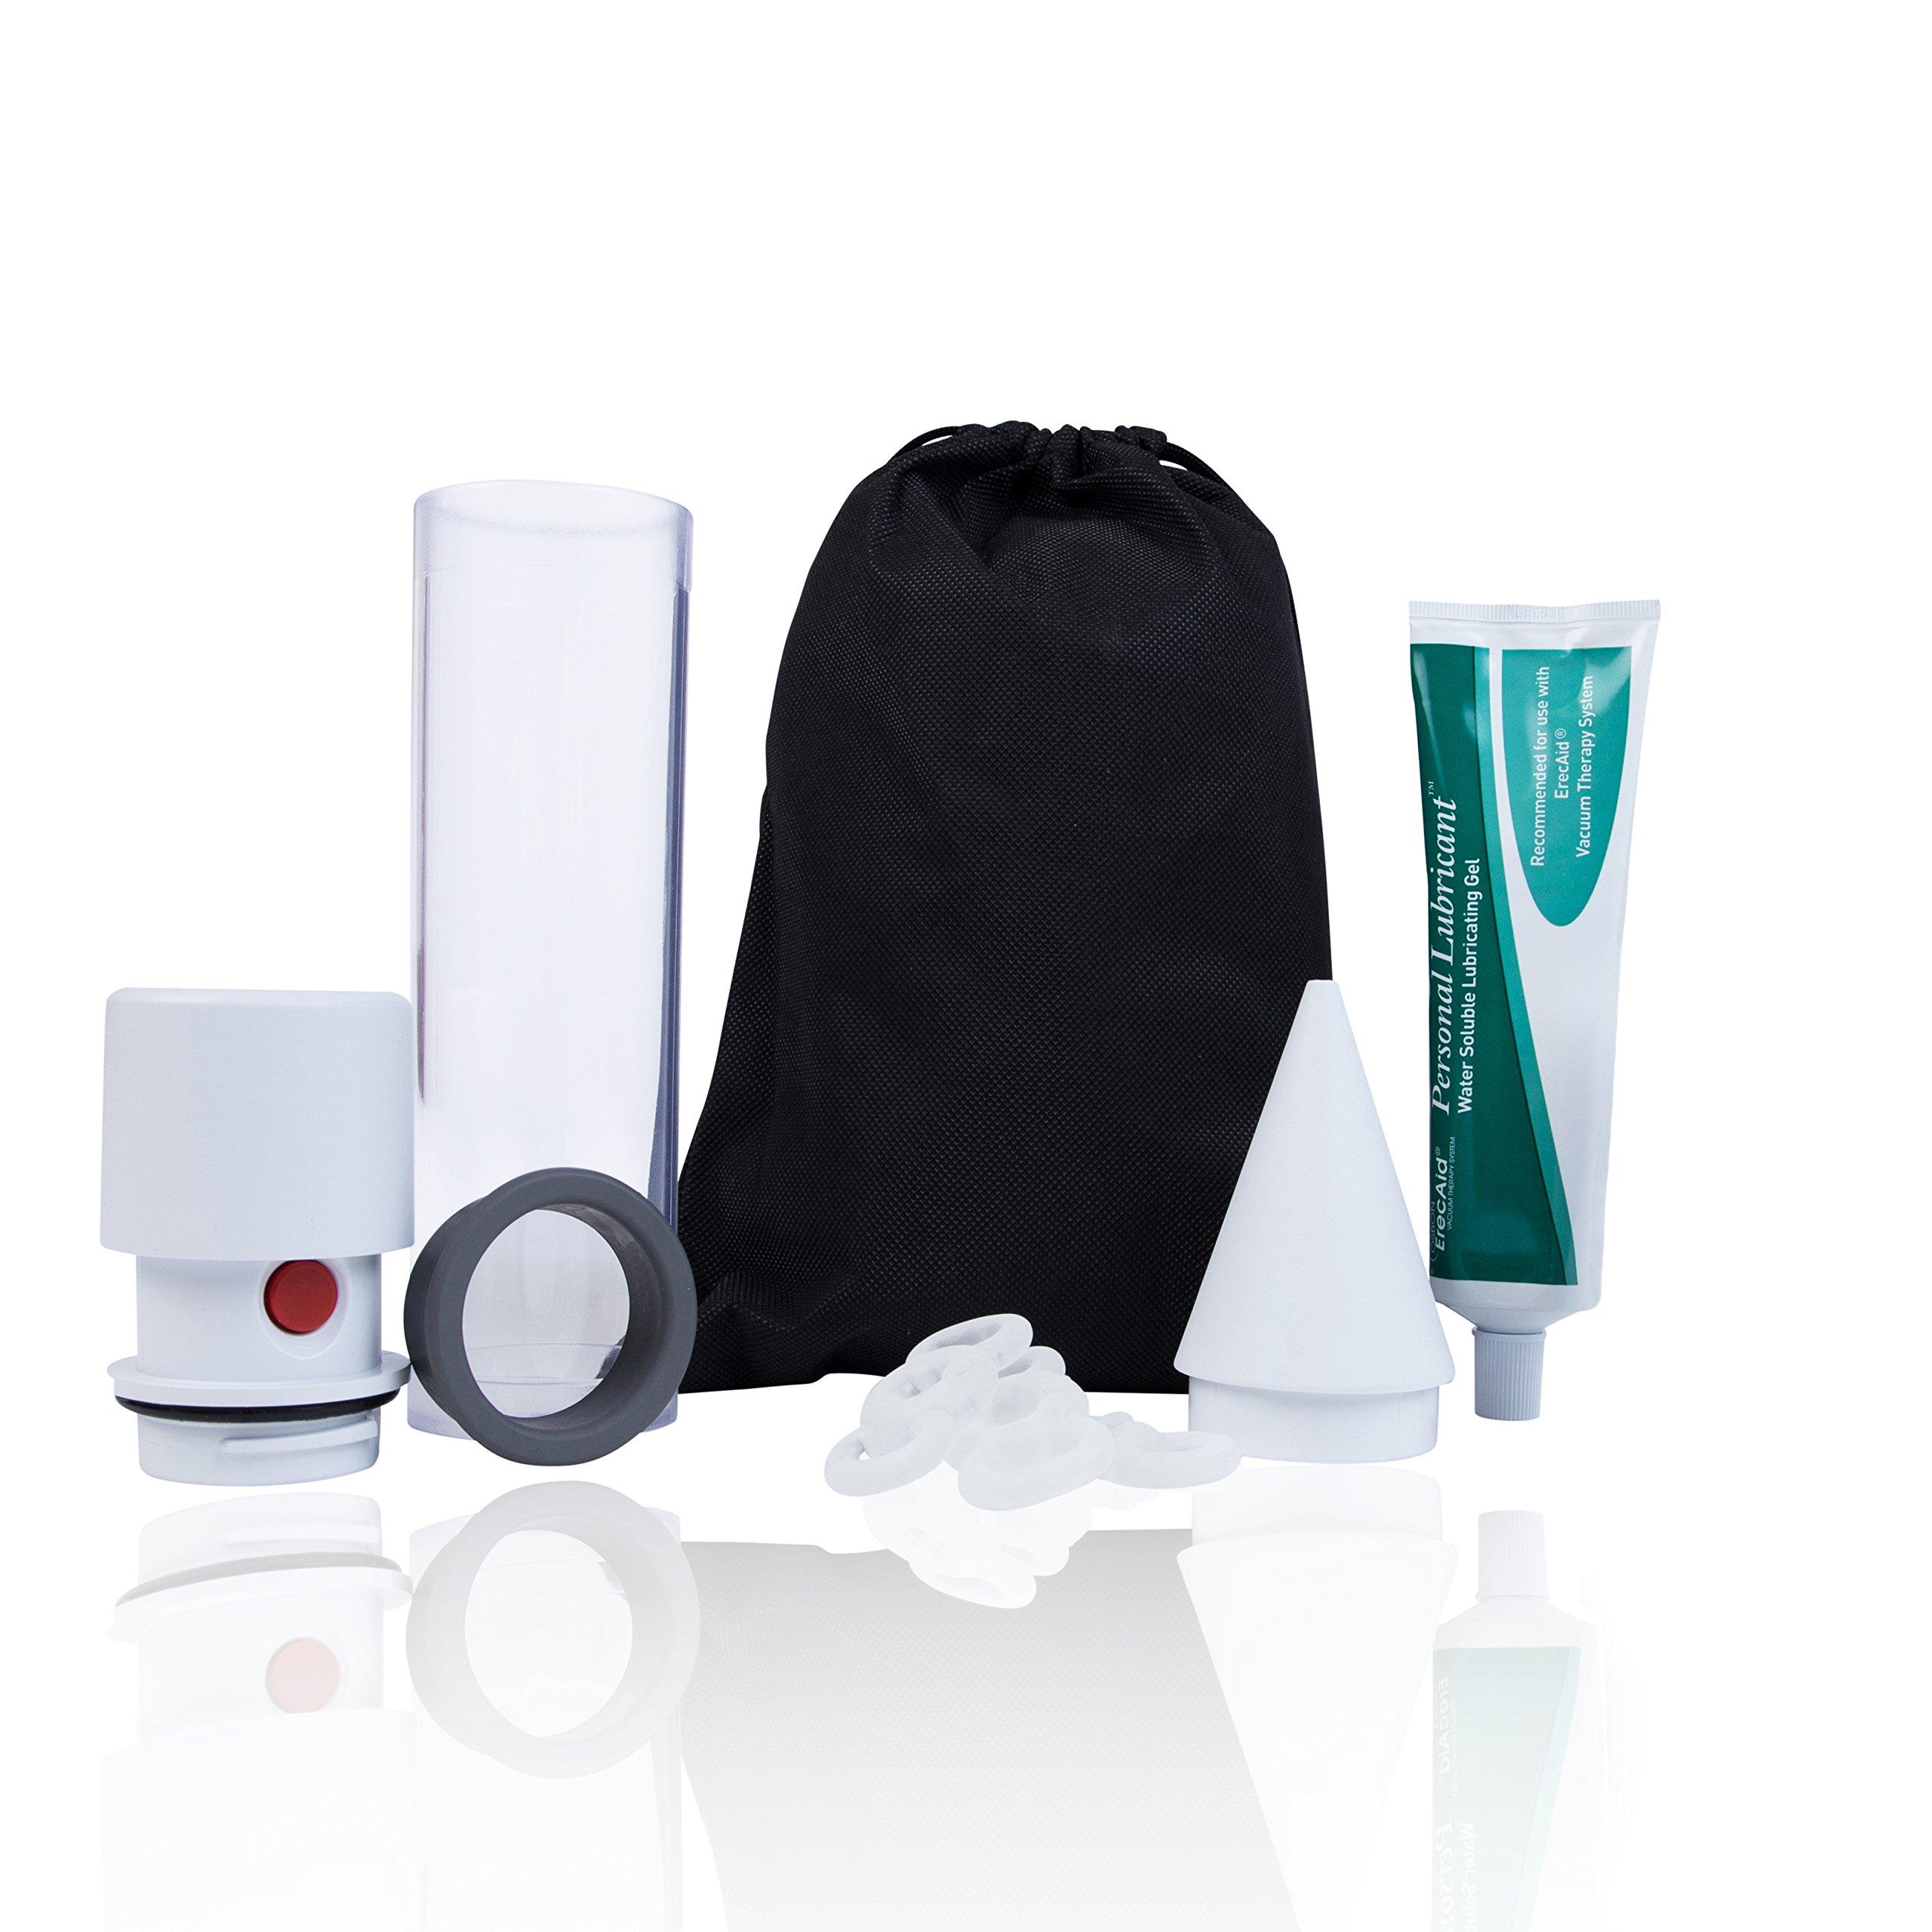 Vacuum Pump for Men, Natural Alternative to Erectile Dysfunction Pills, Manual Penis Pump, Men's Pump Kit for Erectile Dysfunction - Pos-T-Vac, Easy Pro 1000